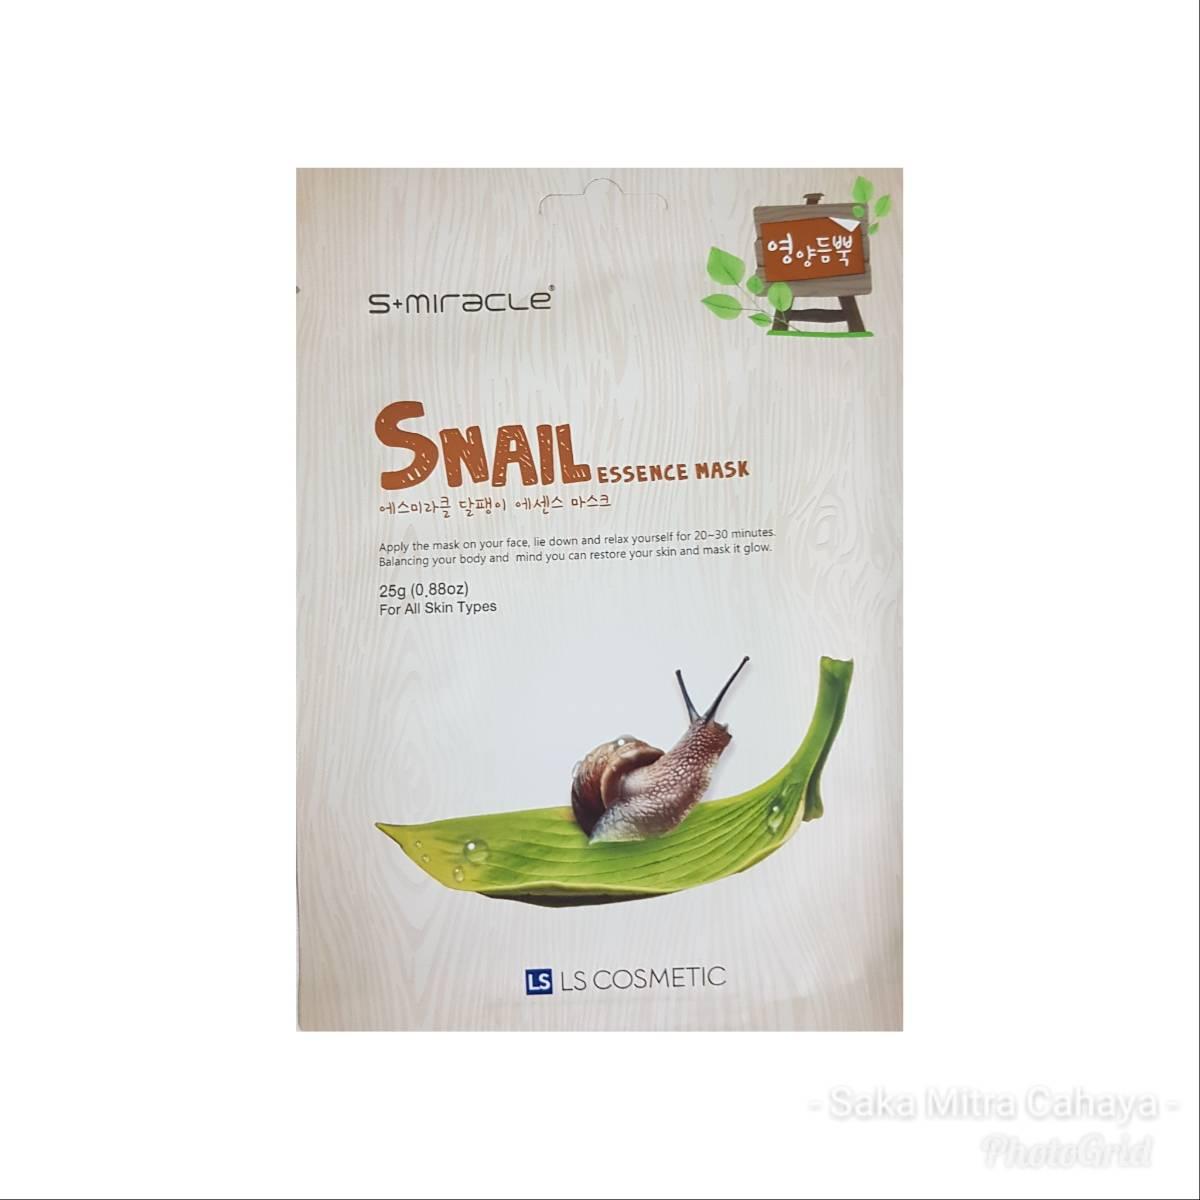 Masker Wajah Korea Snail - S+miracle Snail Essence Mask